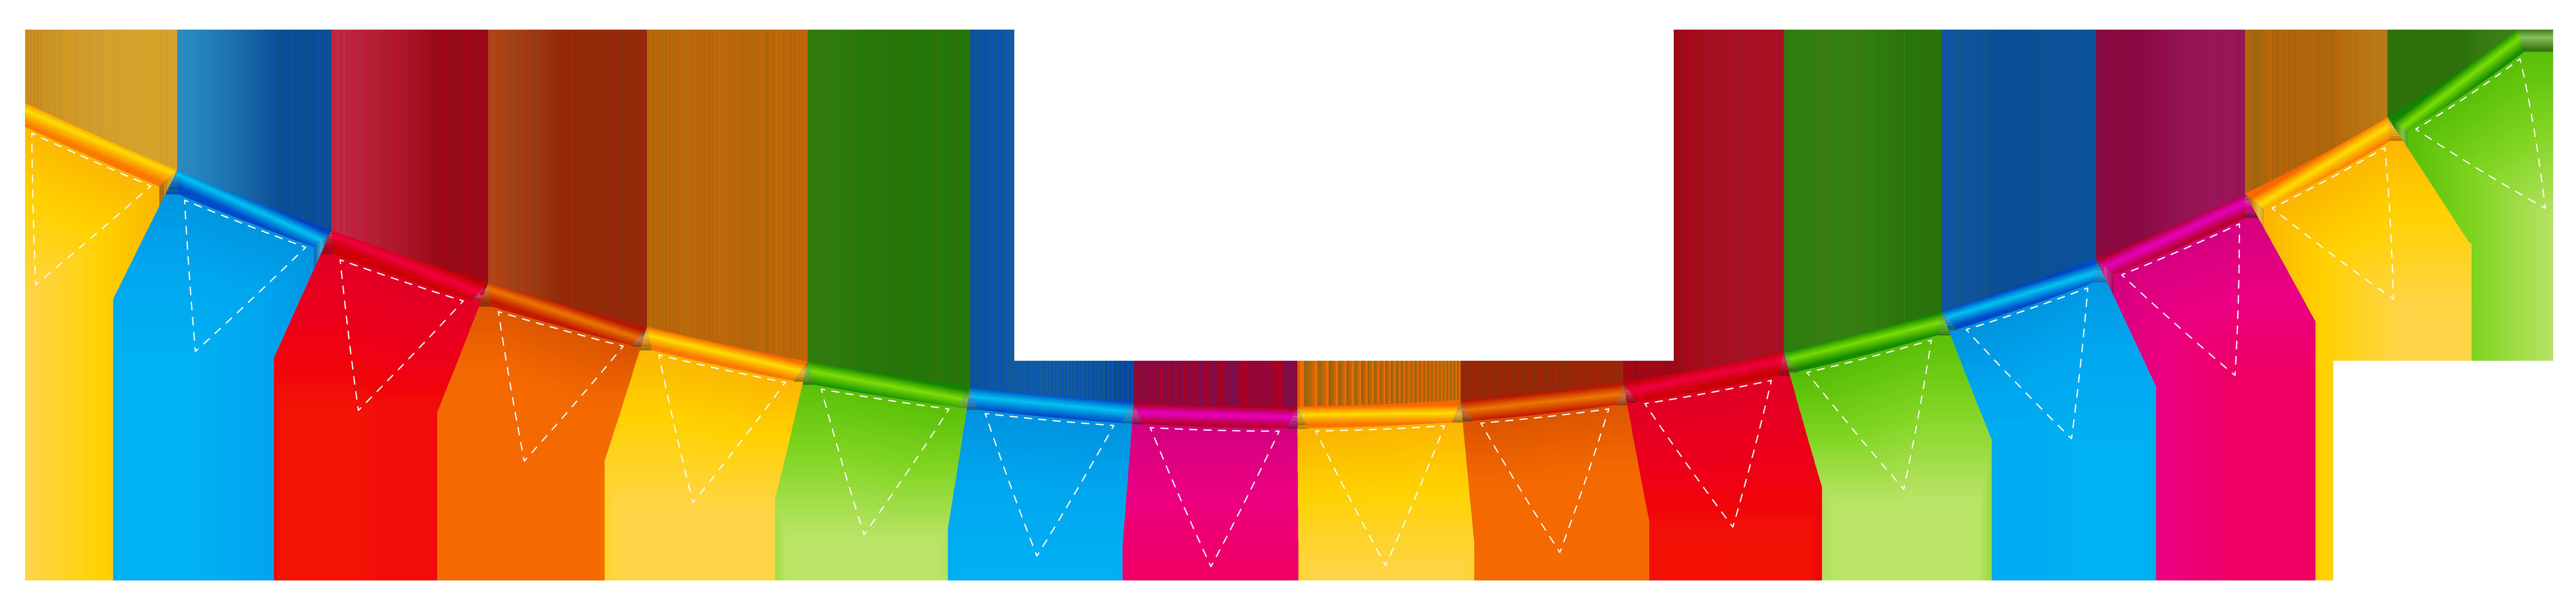 Happy Birthday Border Clipart Free Download Best Happy